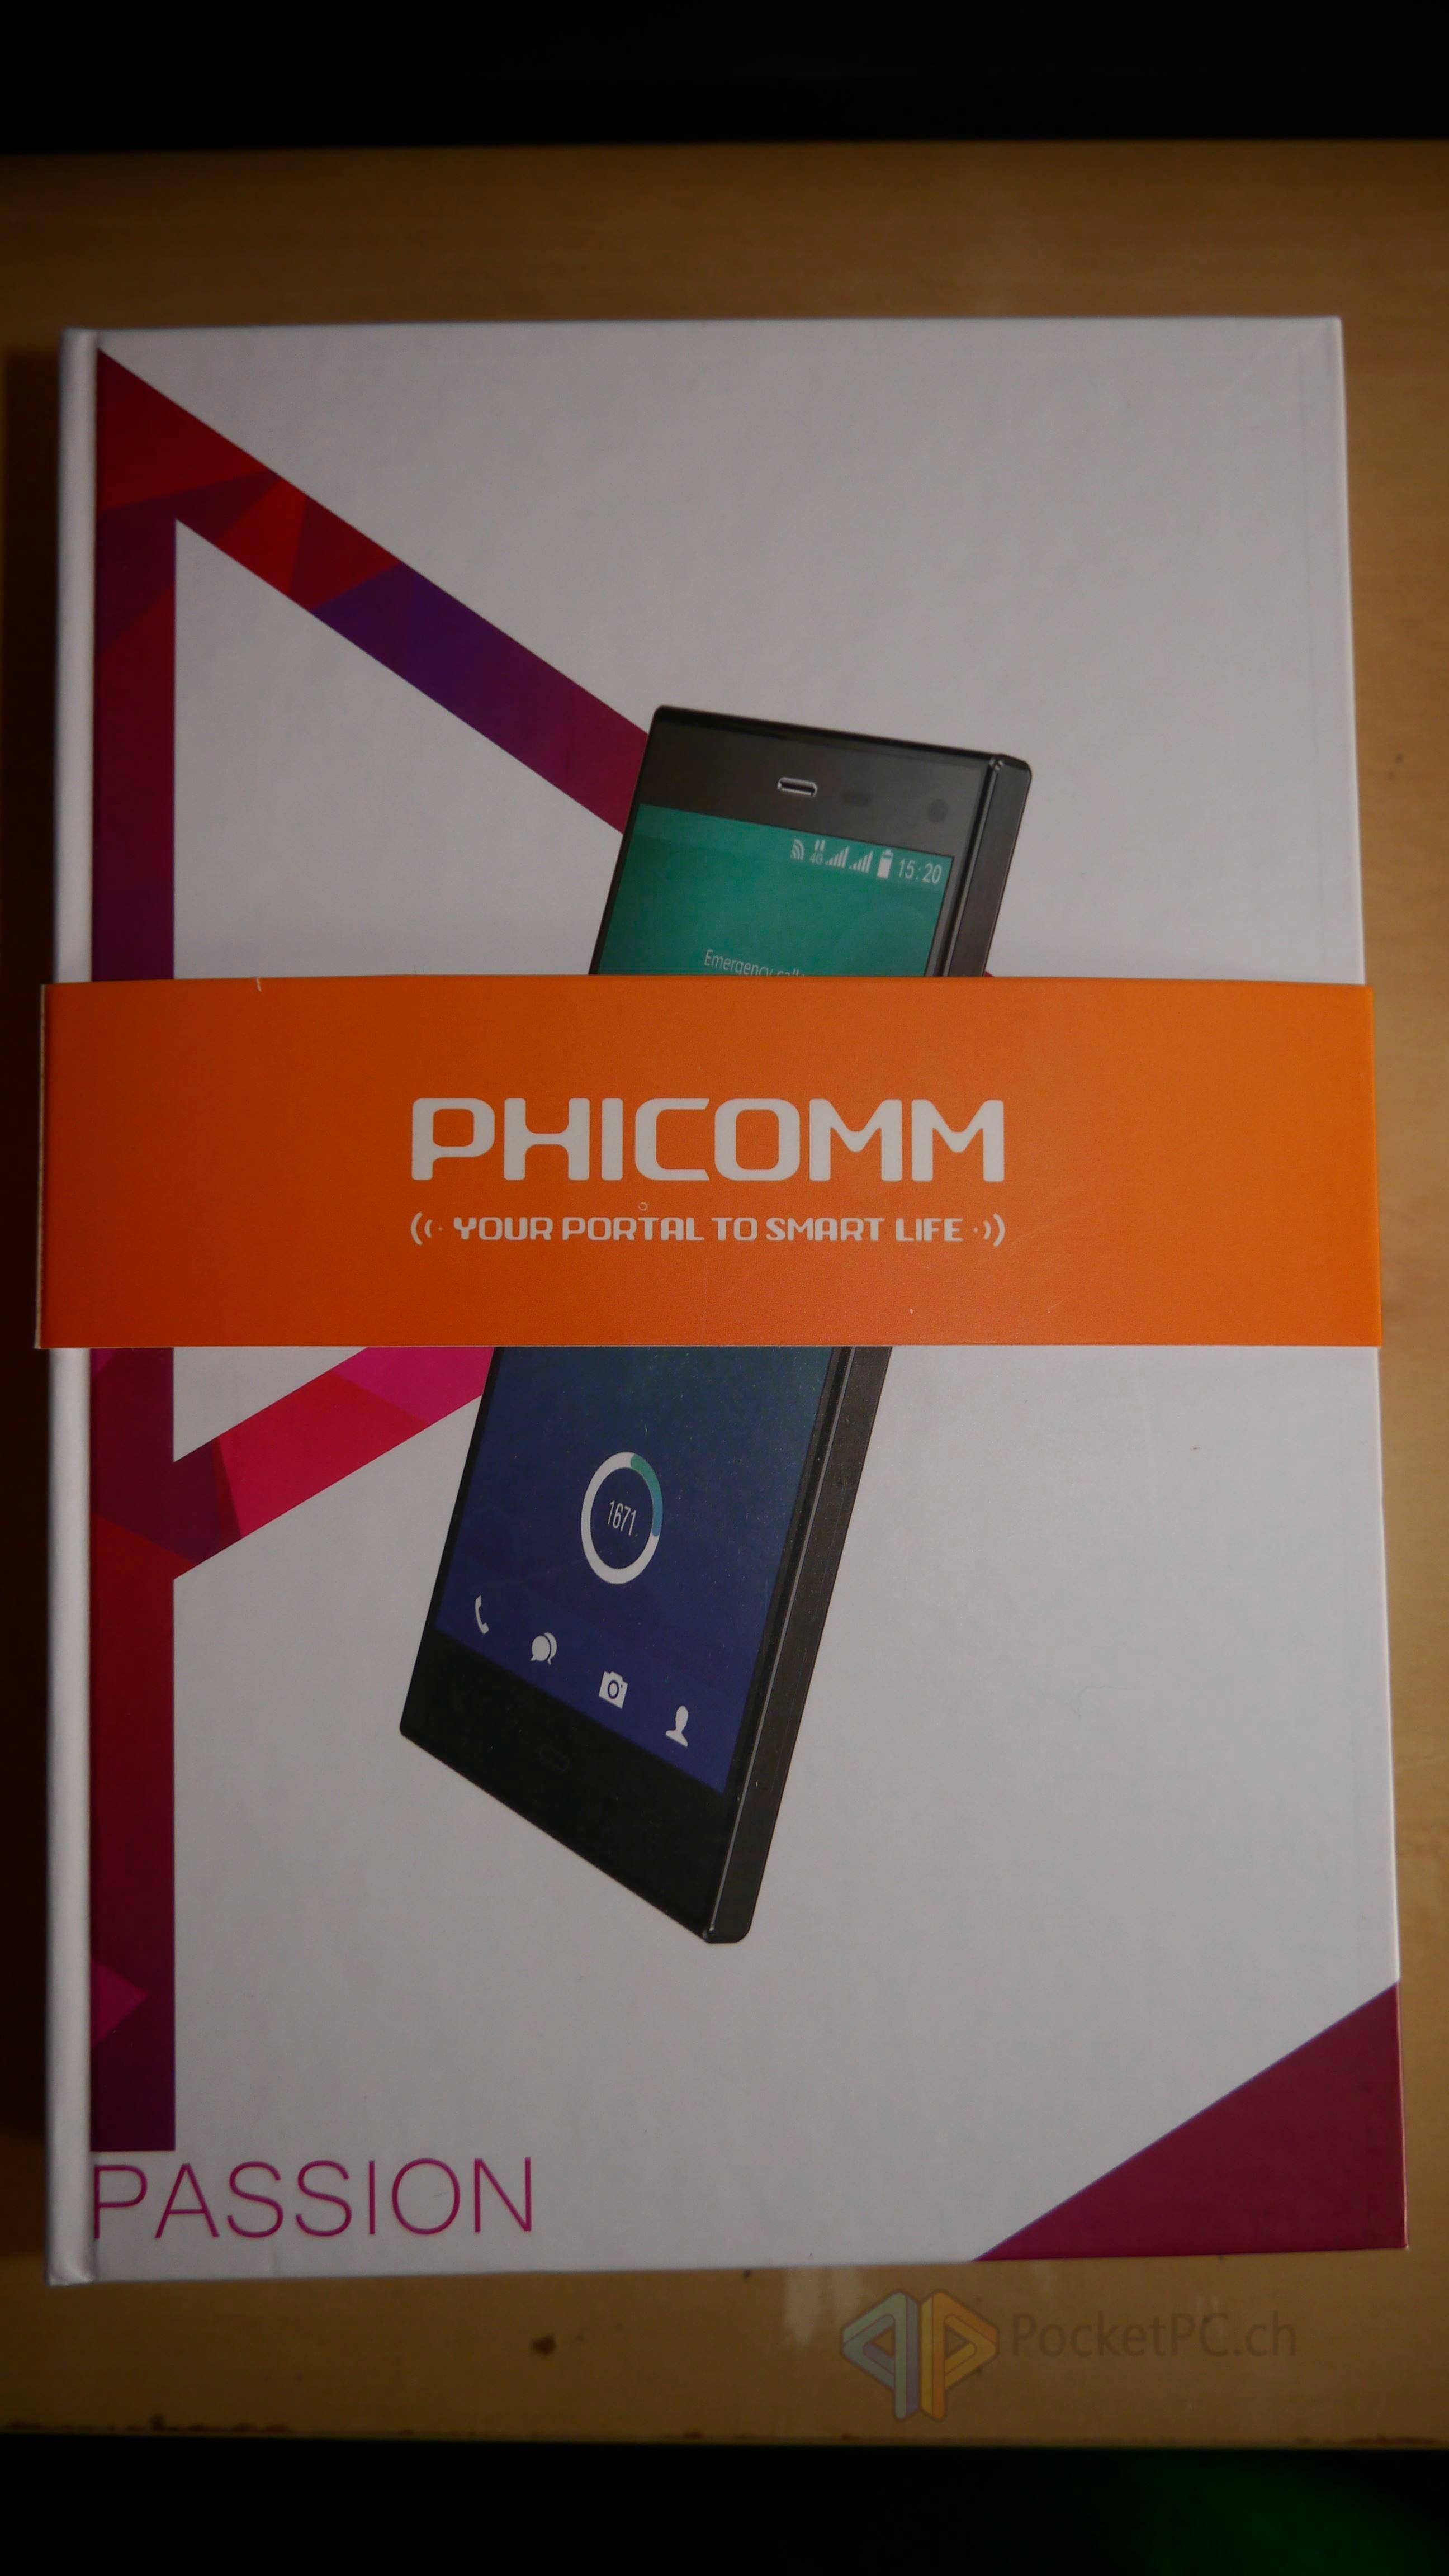 Phicomm Passion Gerät ausgepackt (1)